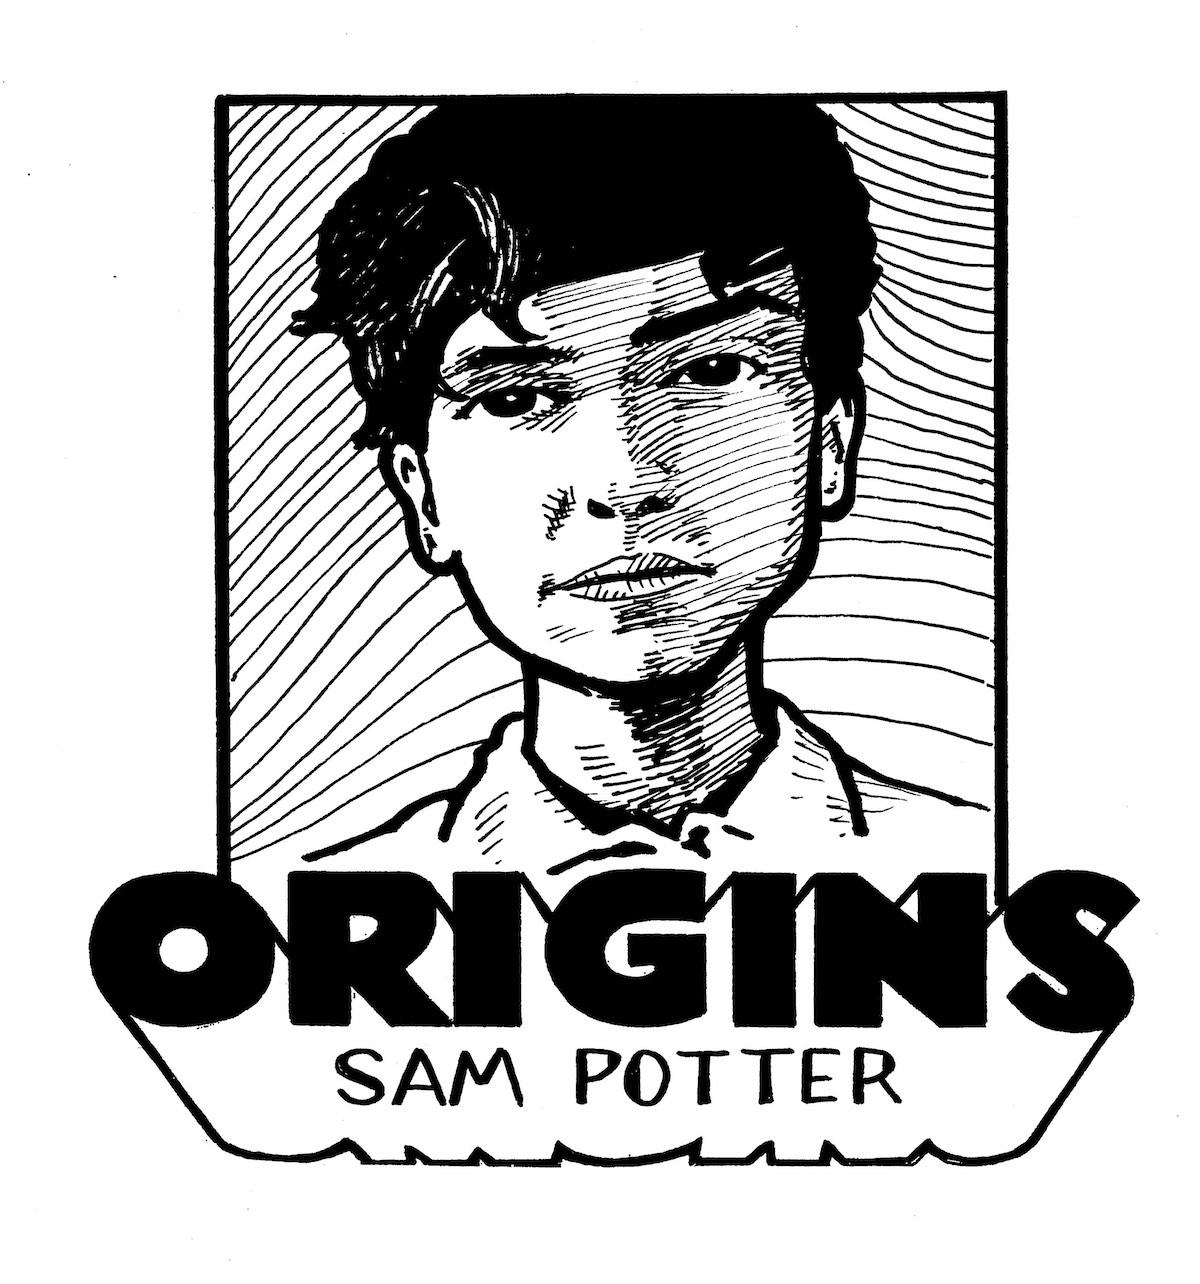 Sam Potter